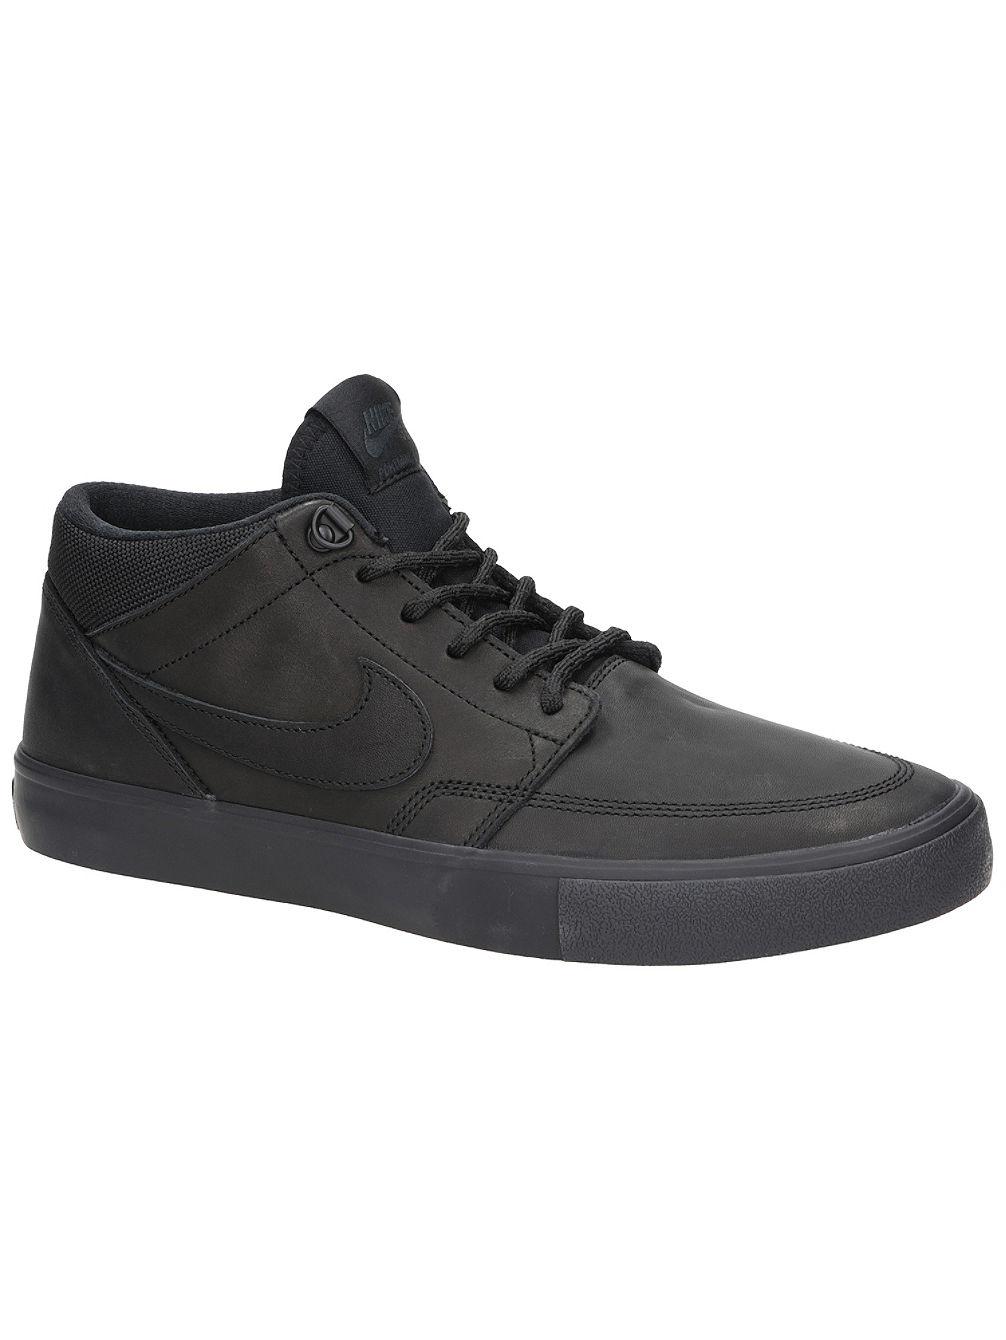 1616db0f2a57c Buy Nike SB Solarsoft Portmore II Mid Premium Shoes online at Blue ...